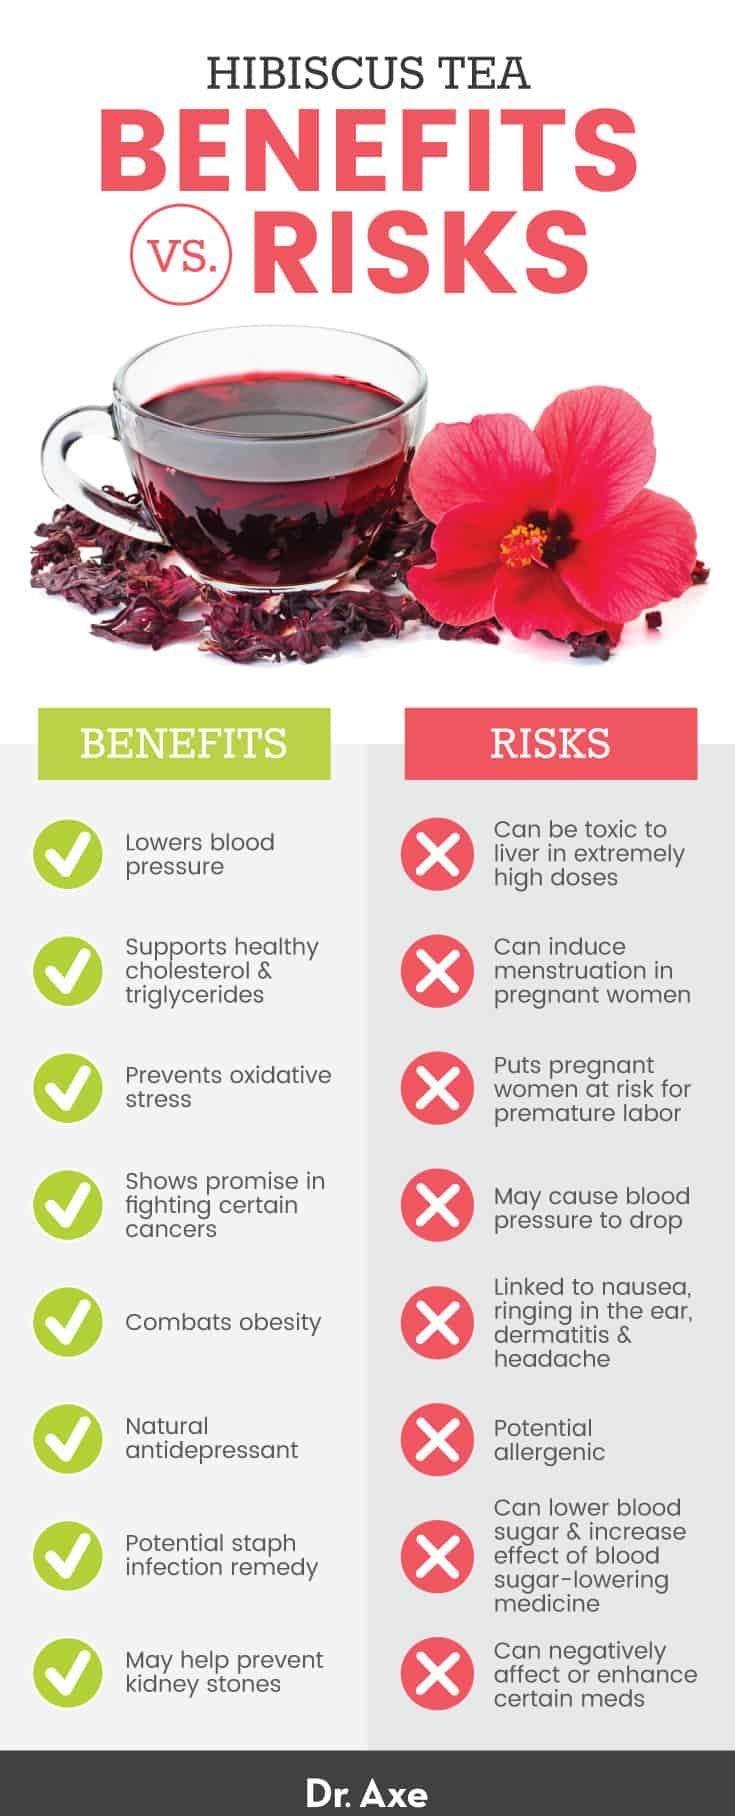 Hibiscus tea benefits vs. risks - Dr. Axe